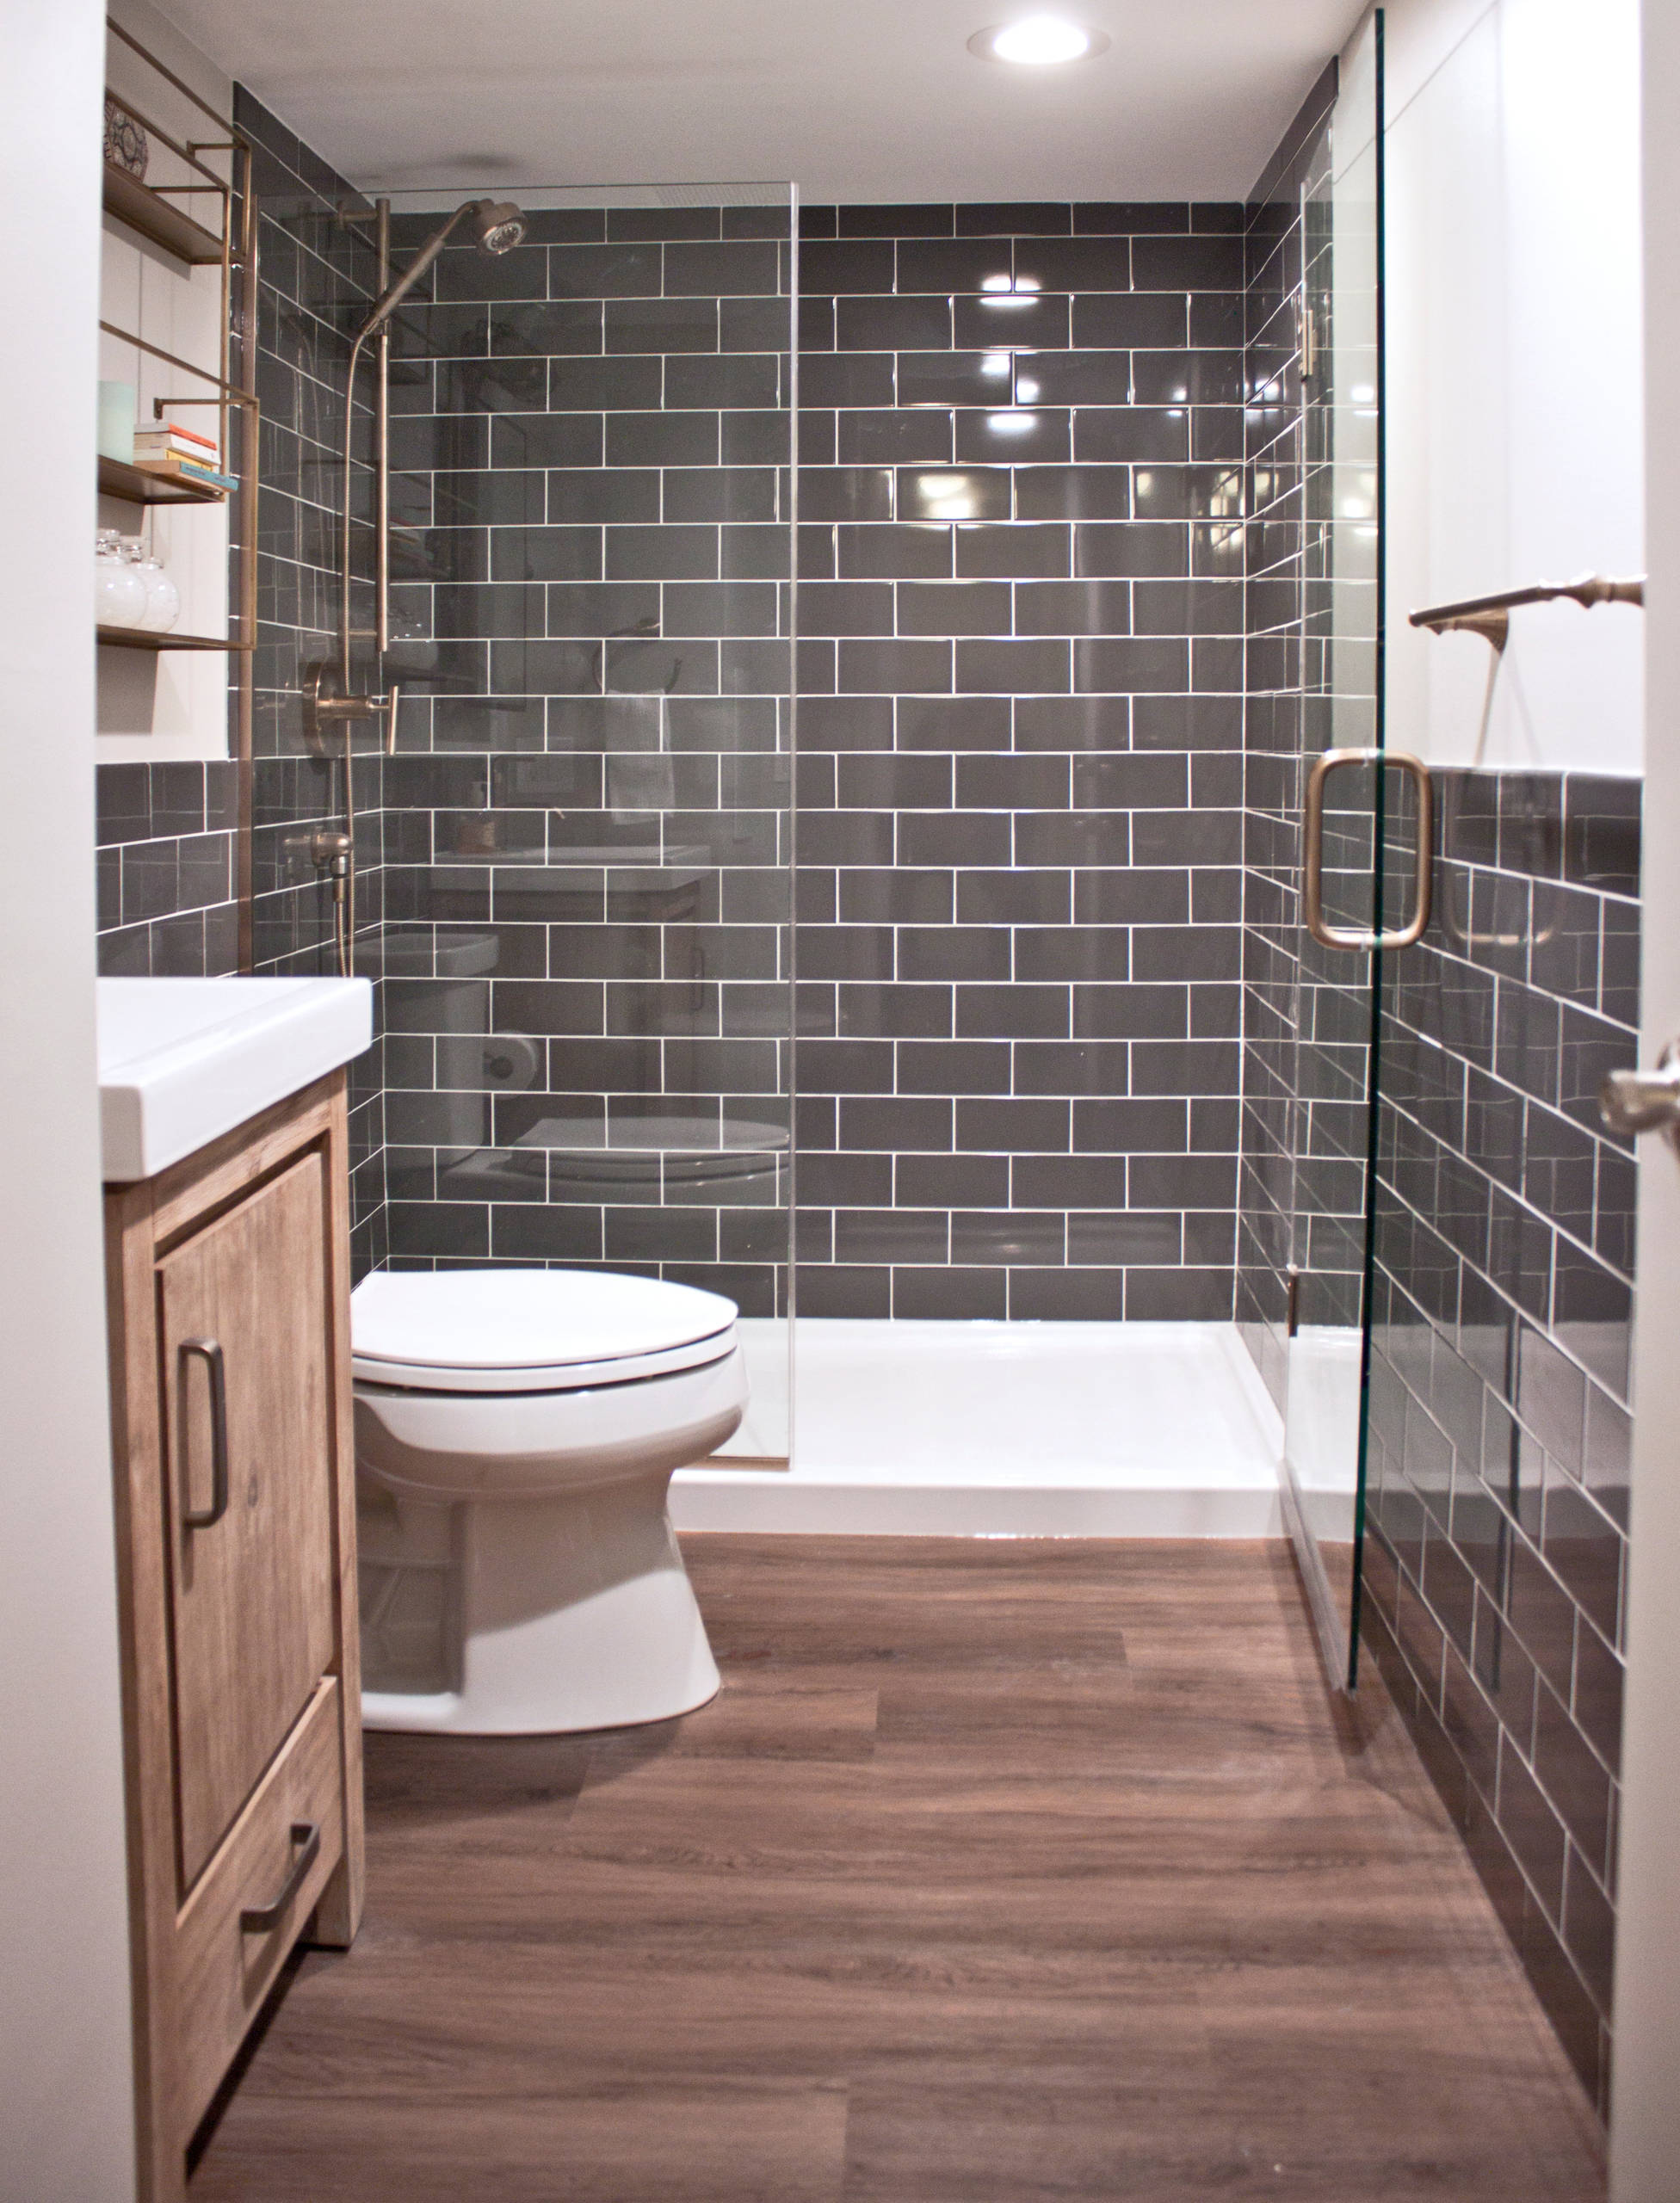 75 beautiful vinyl floor bathroom